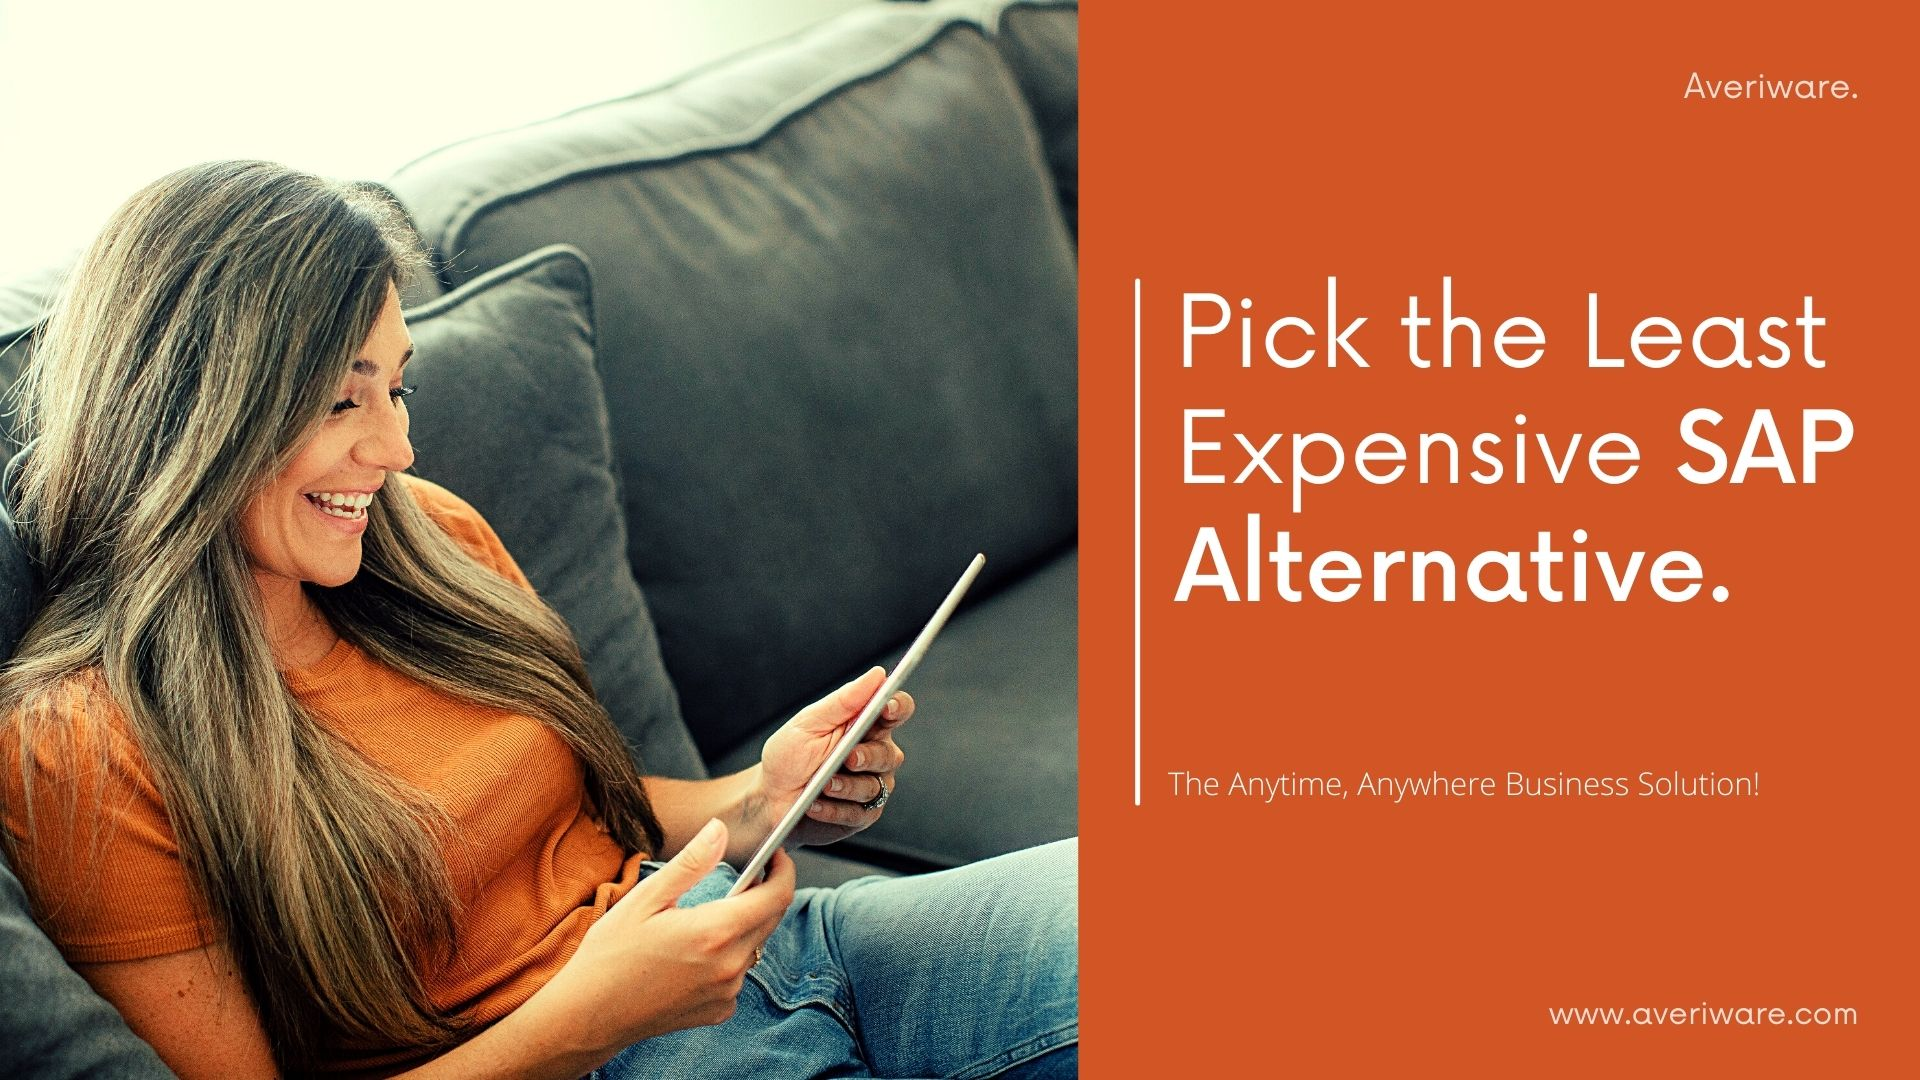 Choose the best SAP Alternative